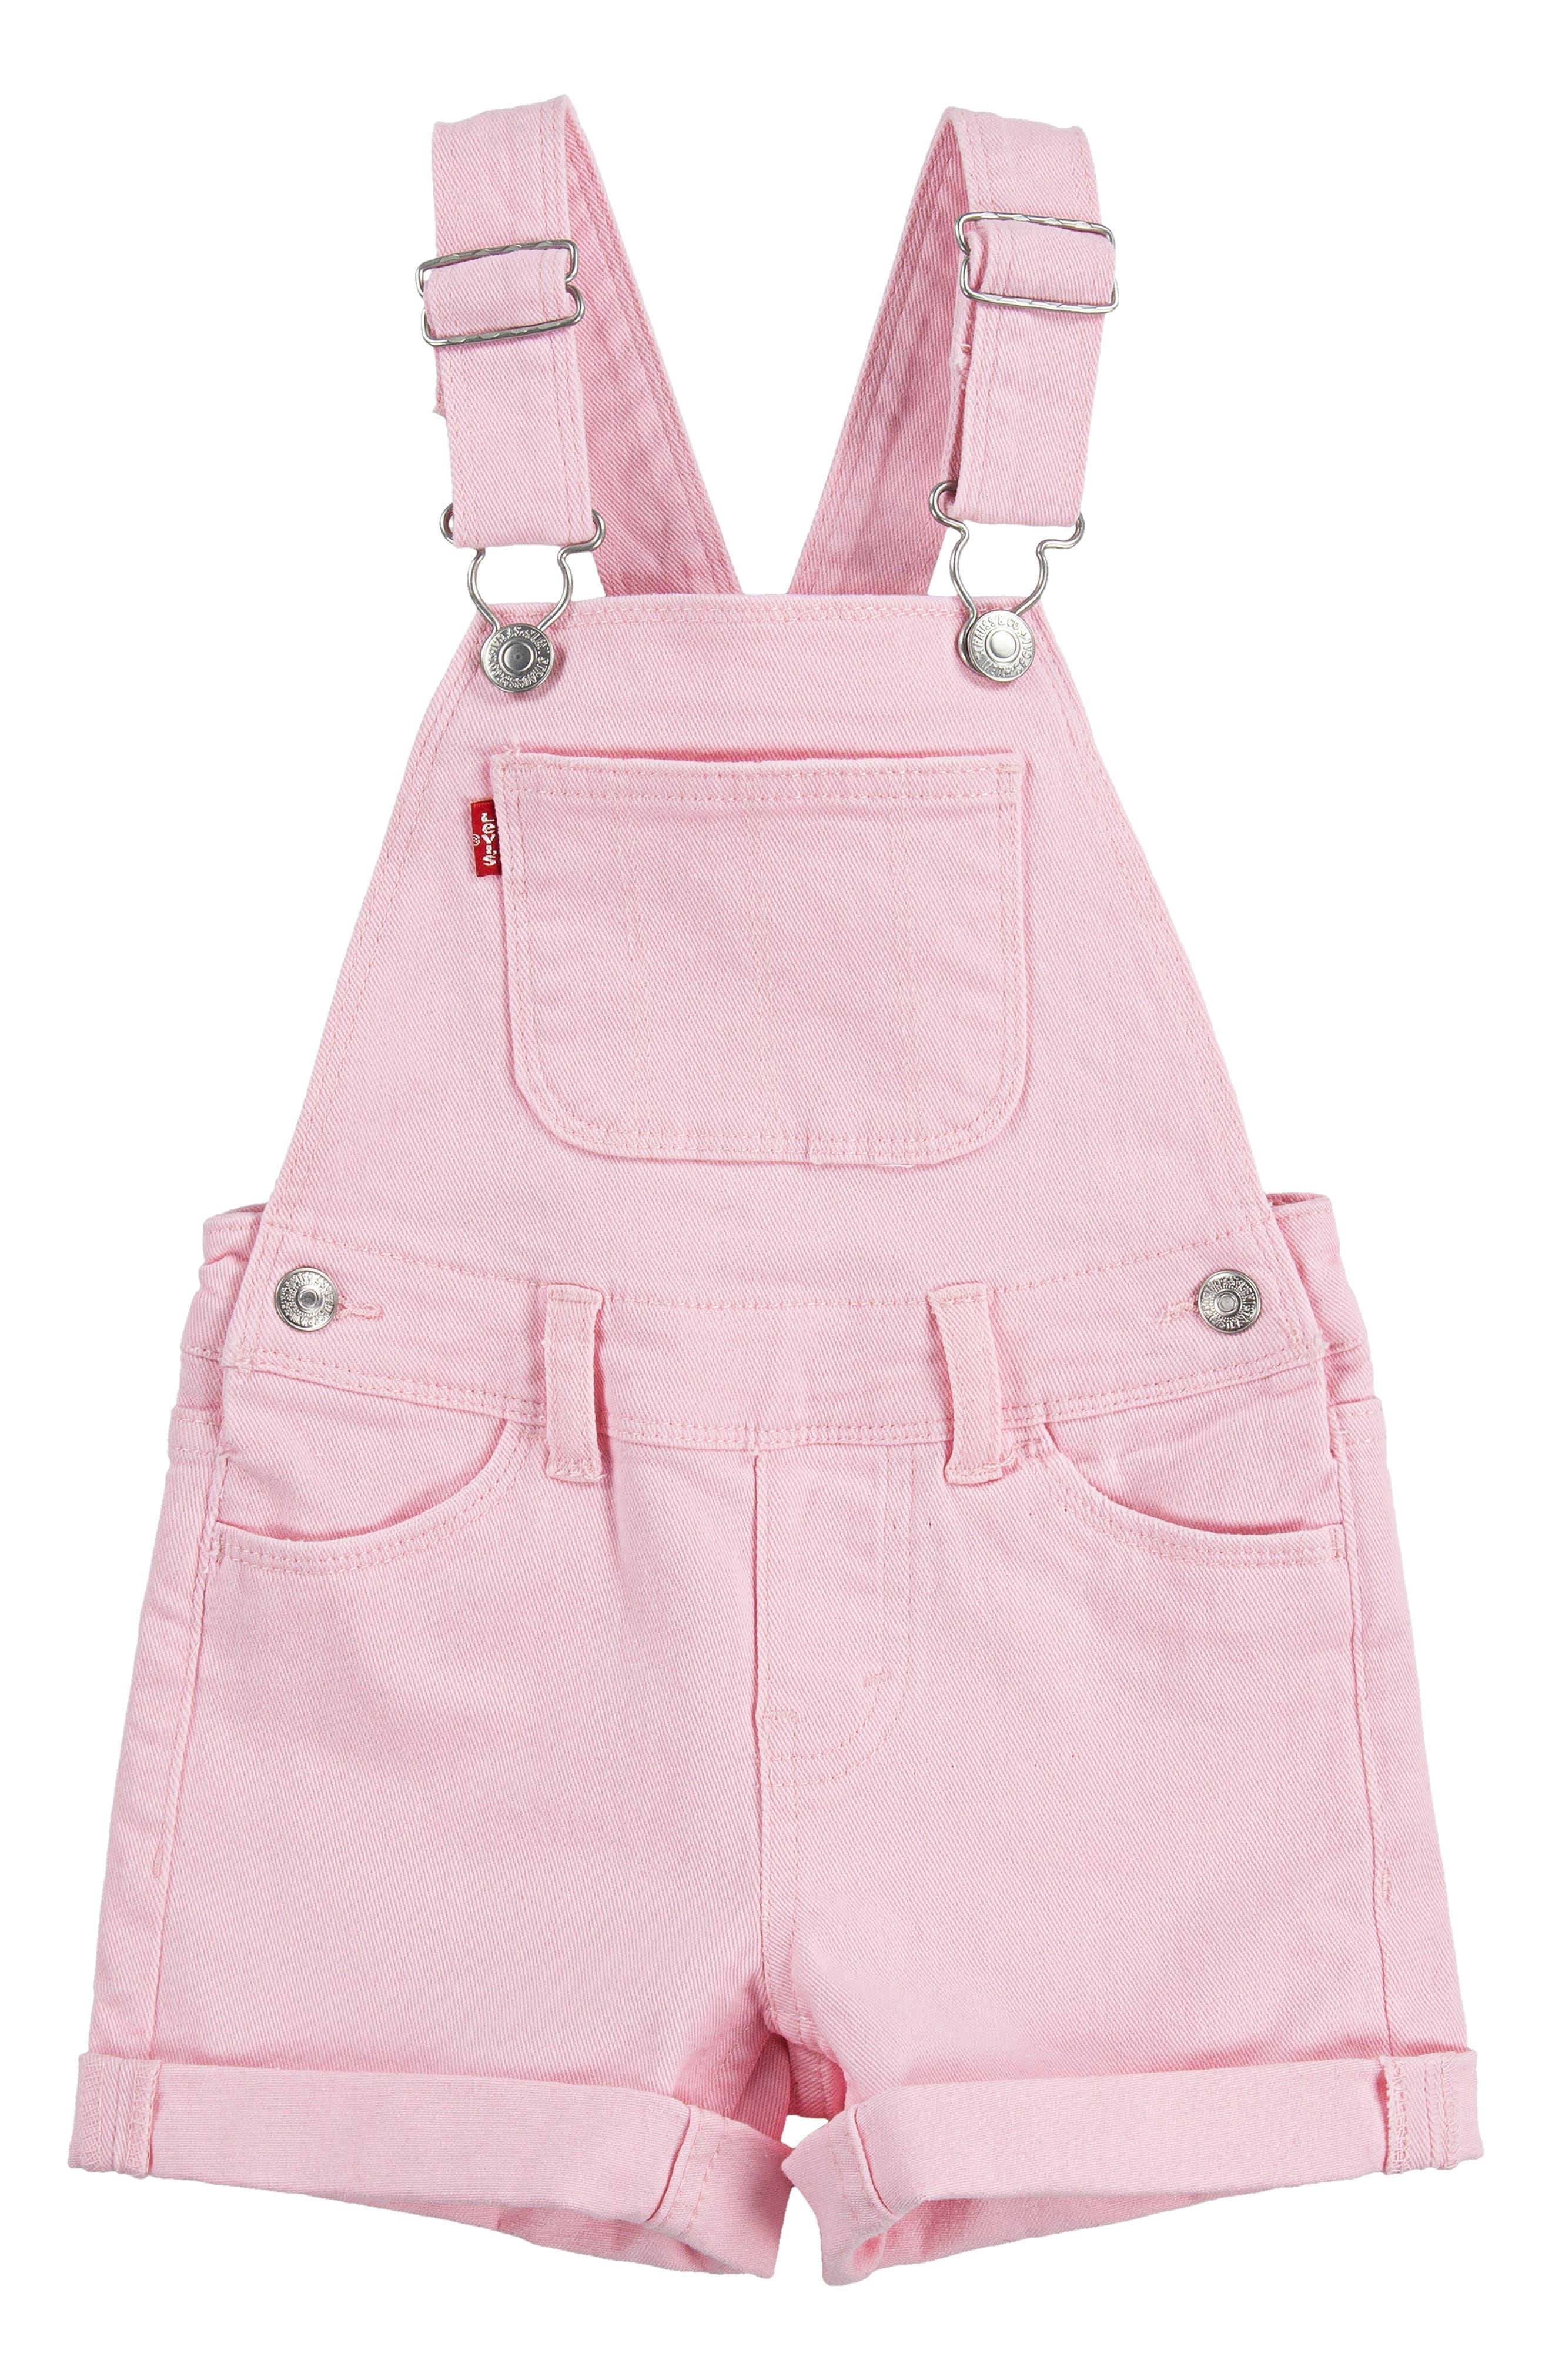 Infant Baby Girl Arizona Polka Dot Denim Heart Shorts Sizes 2T 3T